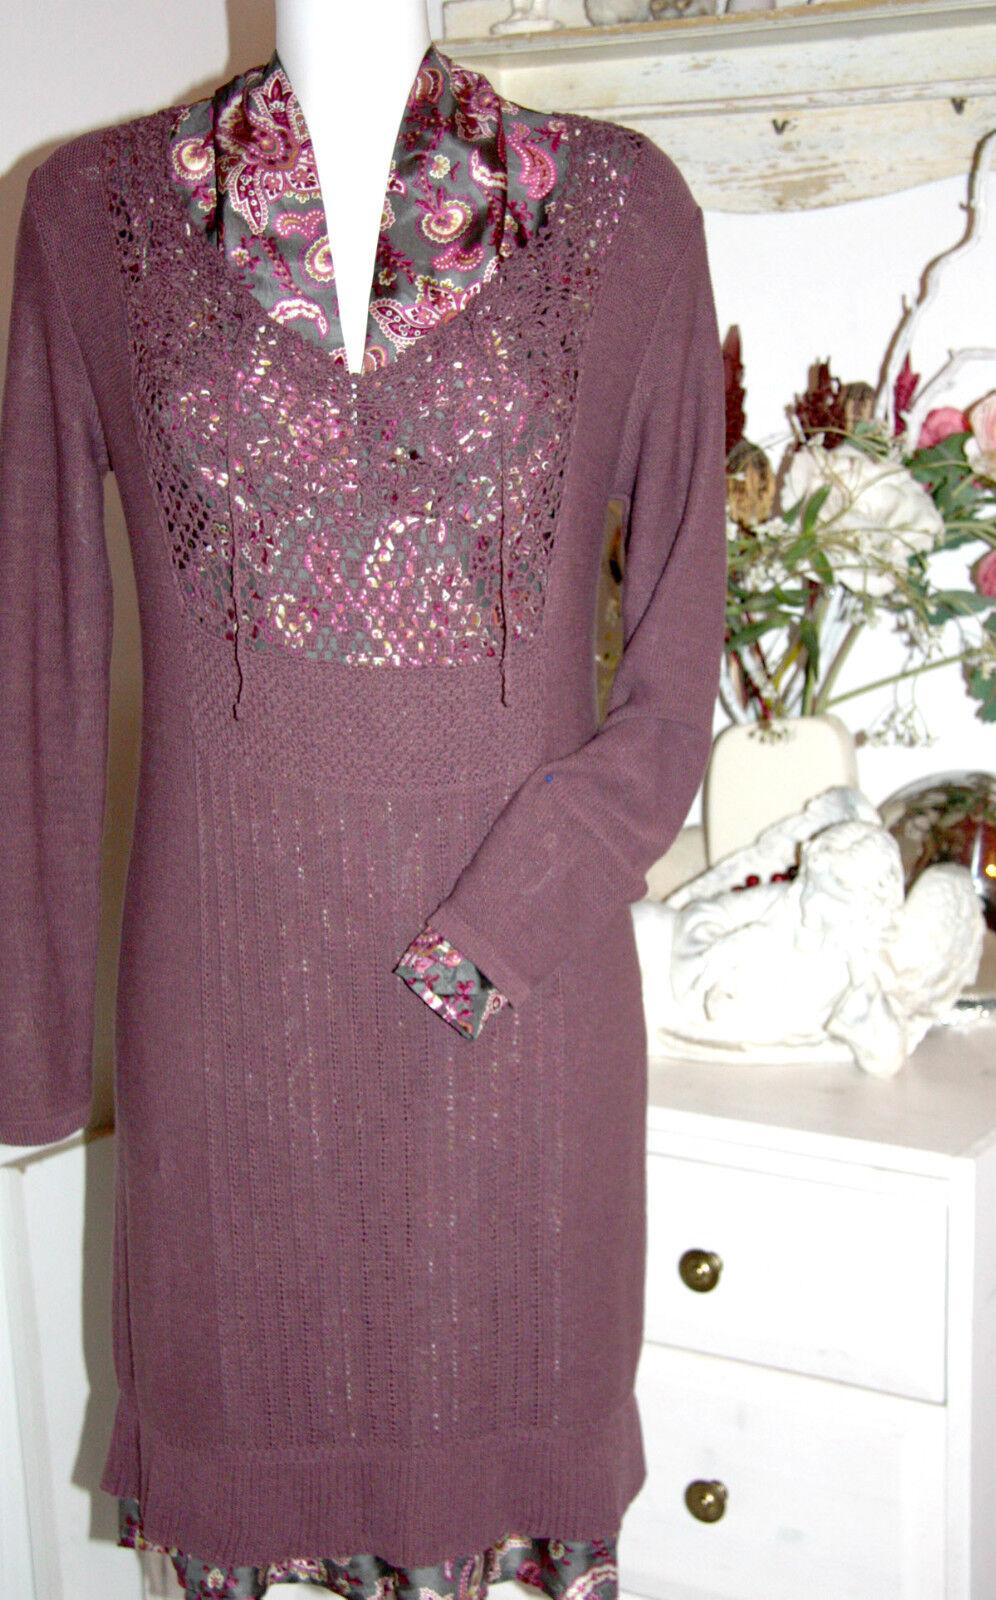 Noa Noa  Strick Kleid  Langarm Dress Vienna Knit Dark Fawn   Größe  S Neu